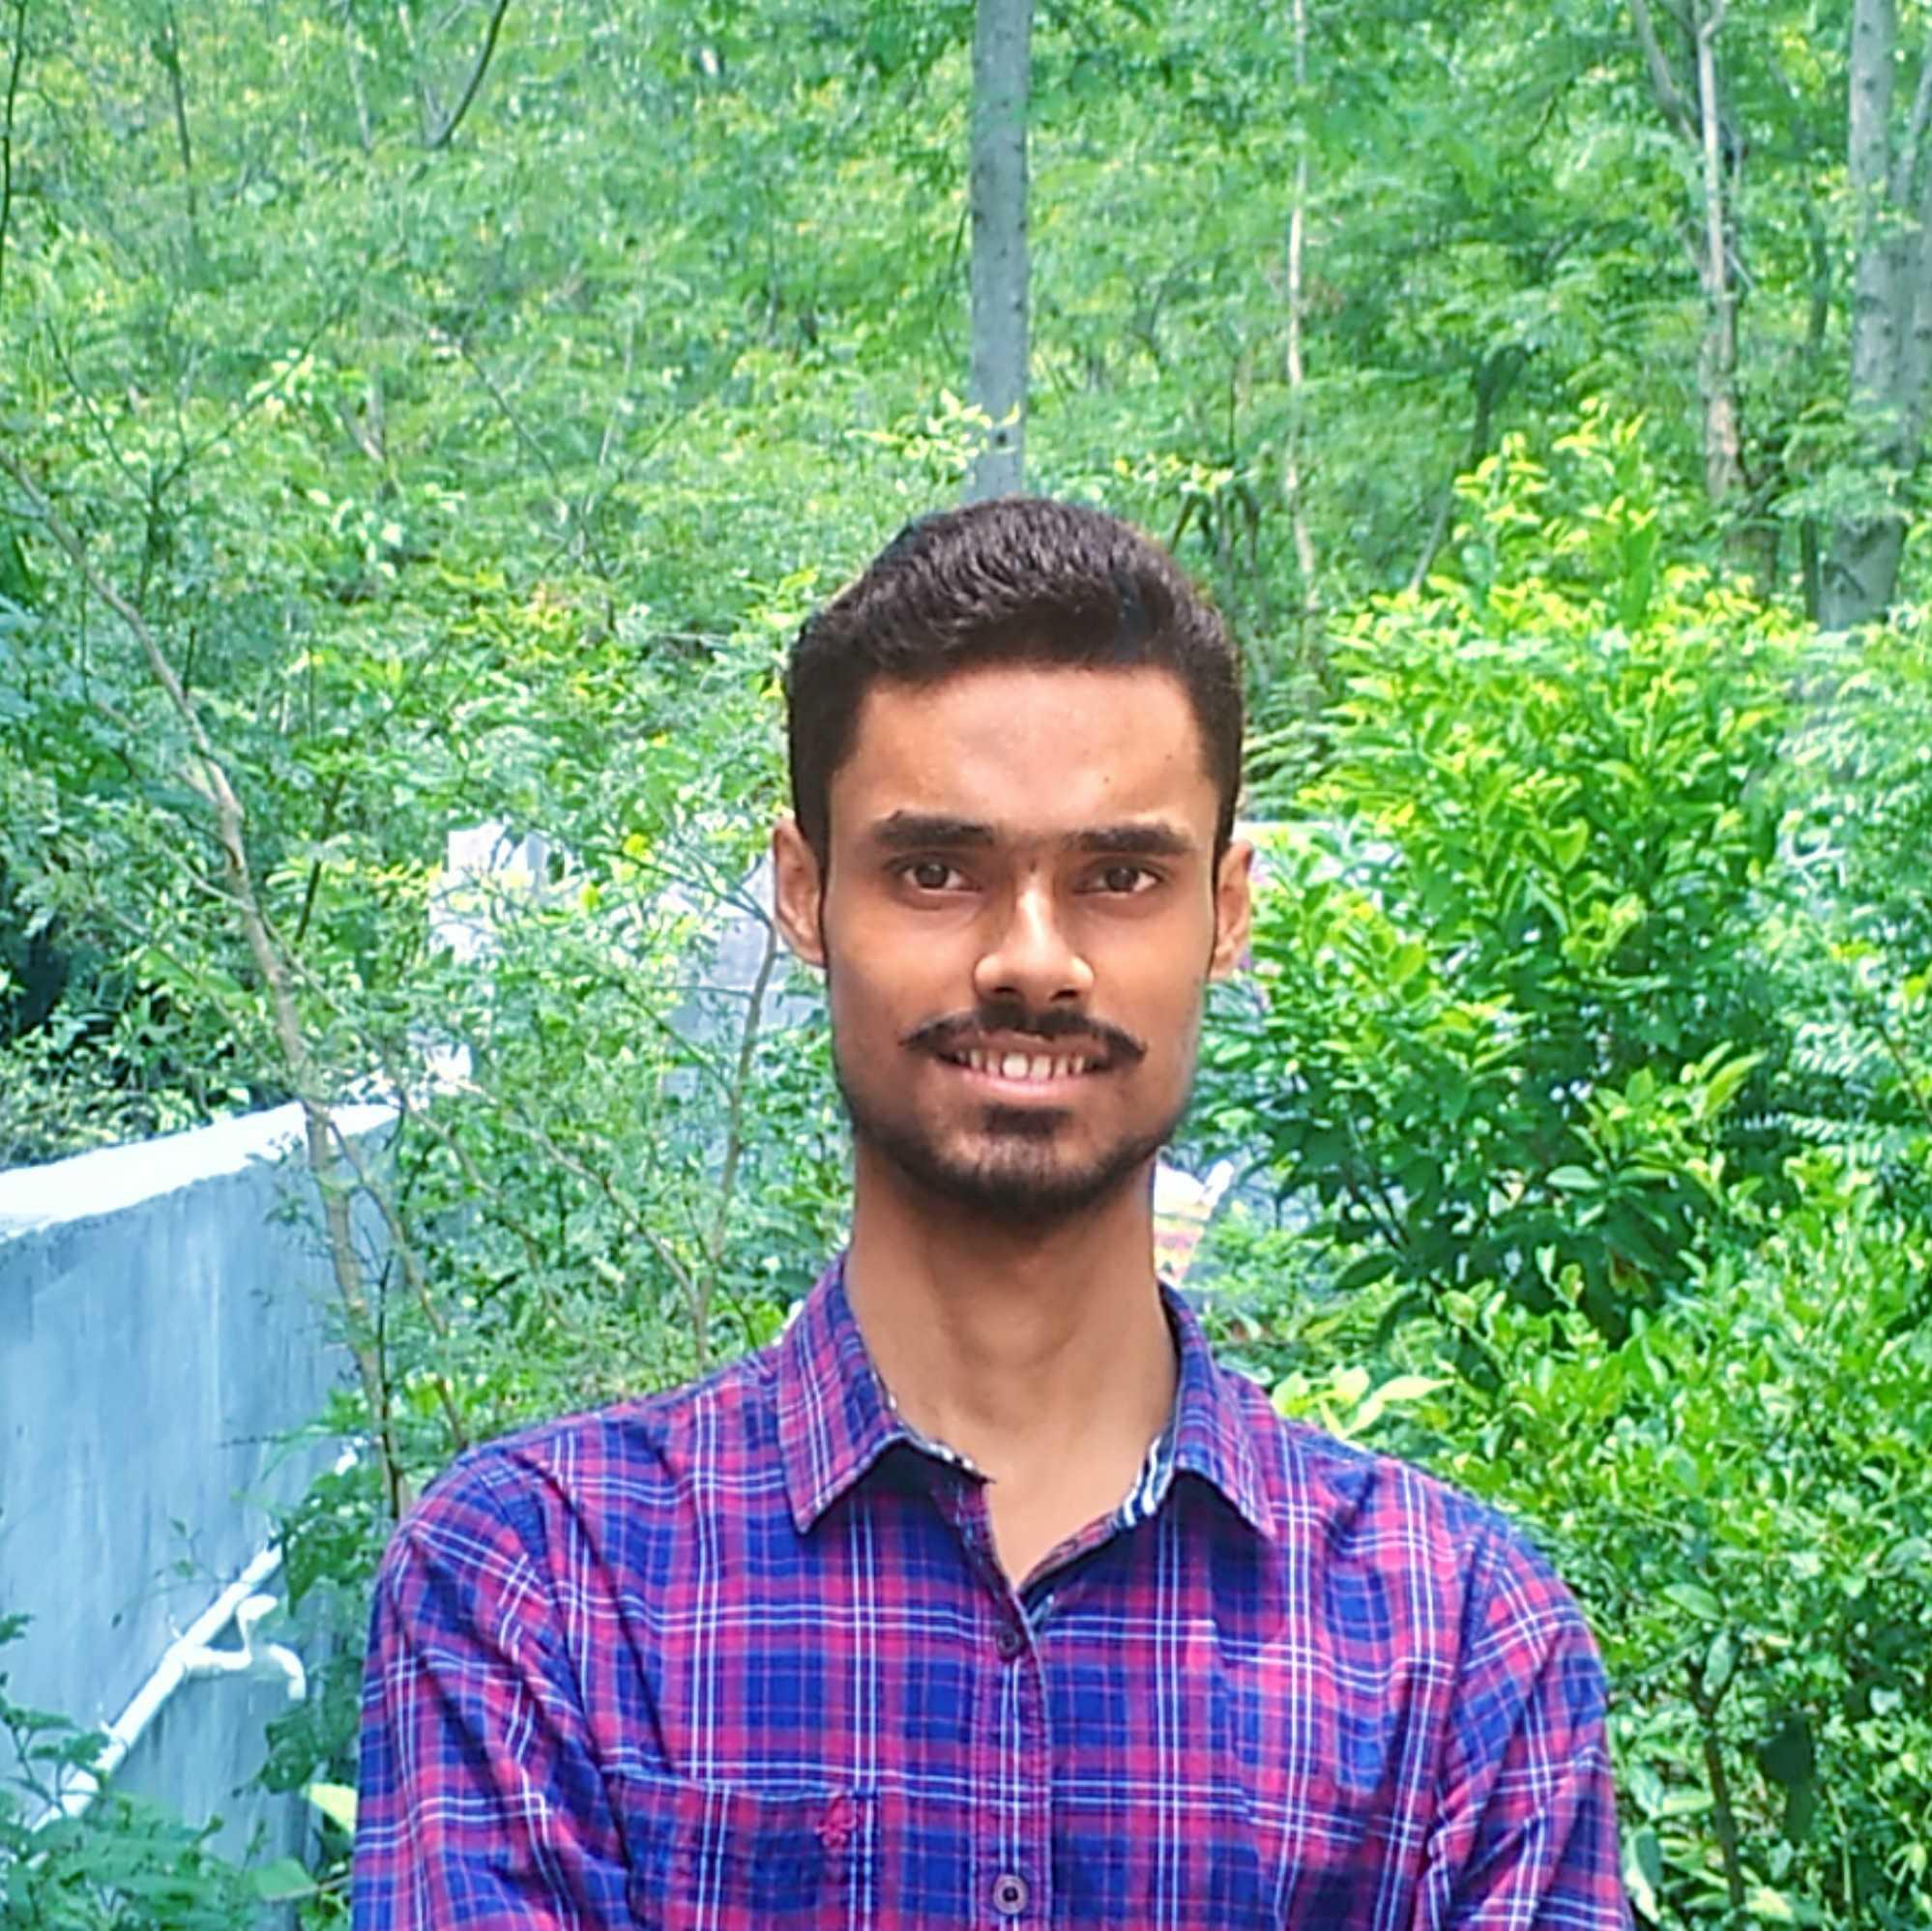 Satamanyu Sadangi